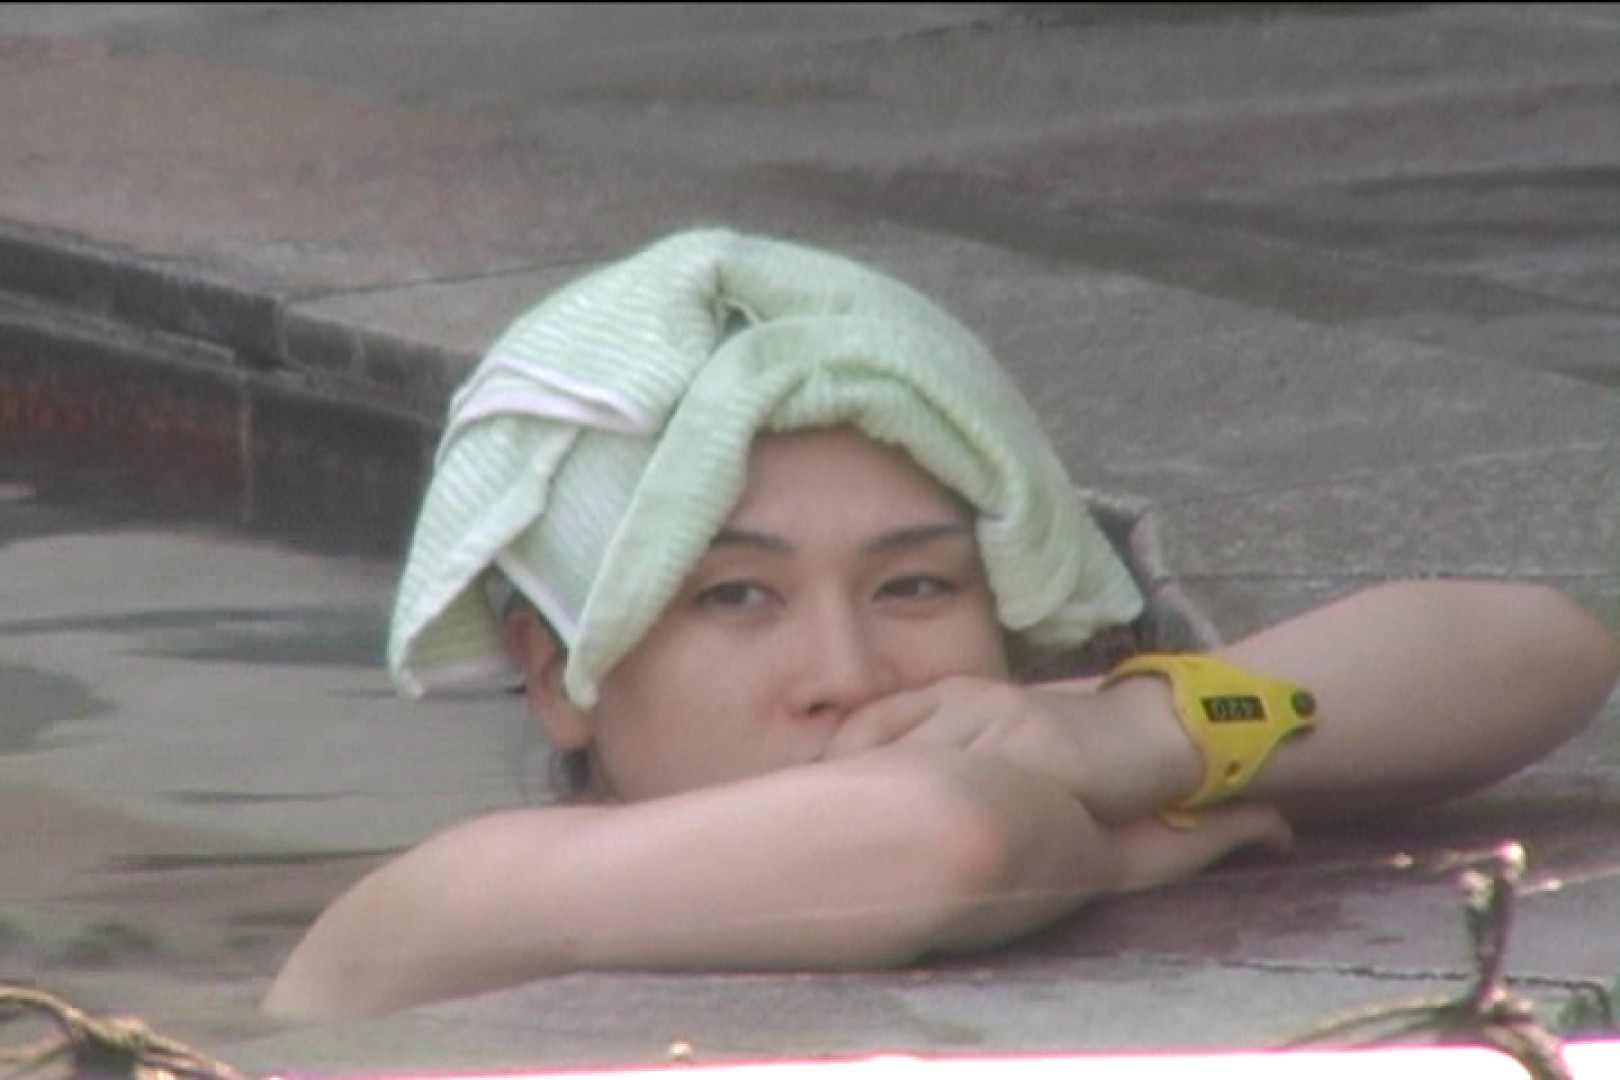 Aquaな露天風呂Vol.528 露天 | 盗撮特撮  11pic 4